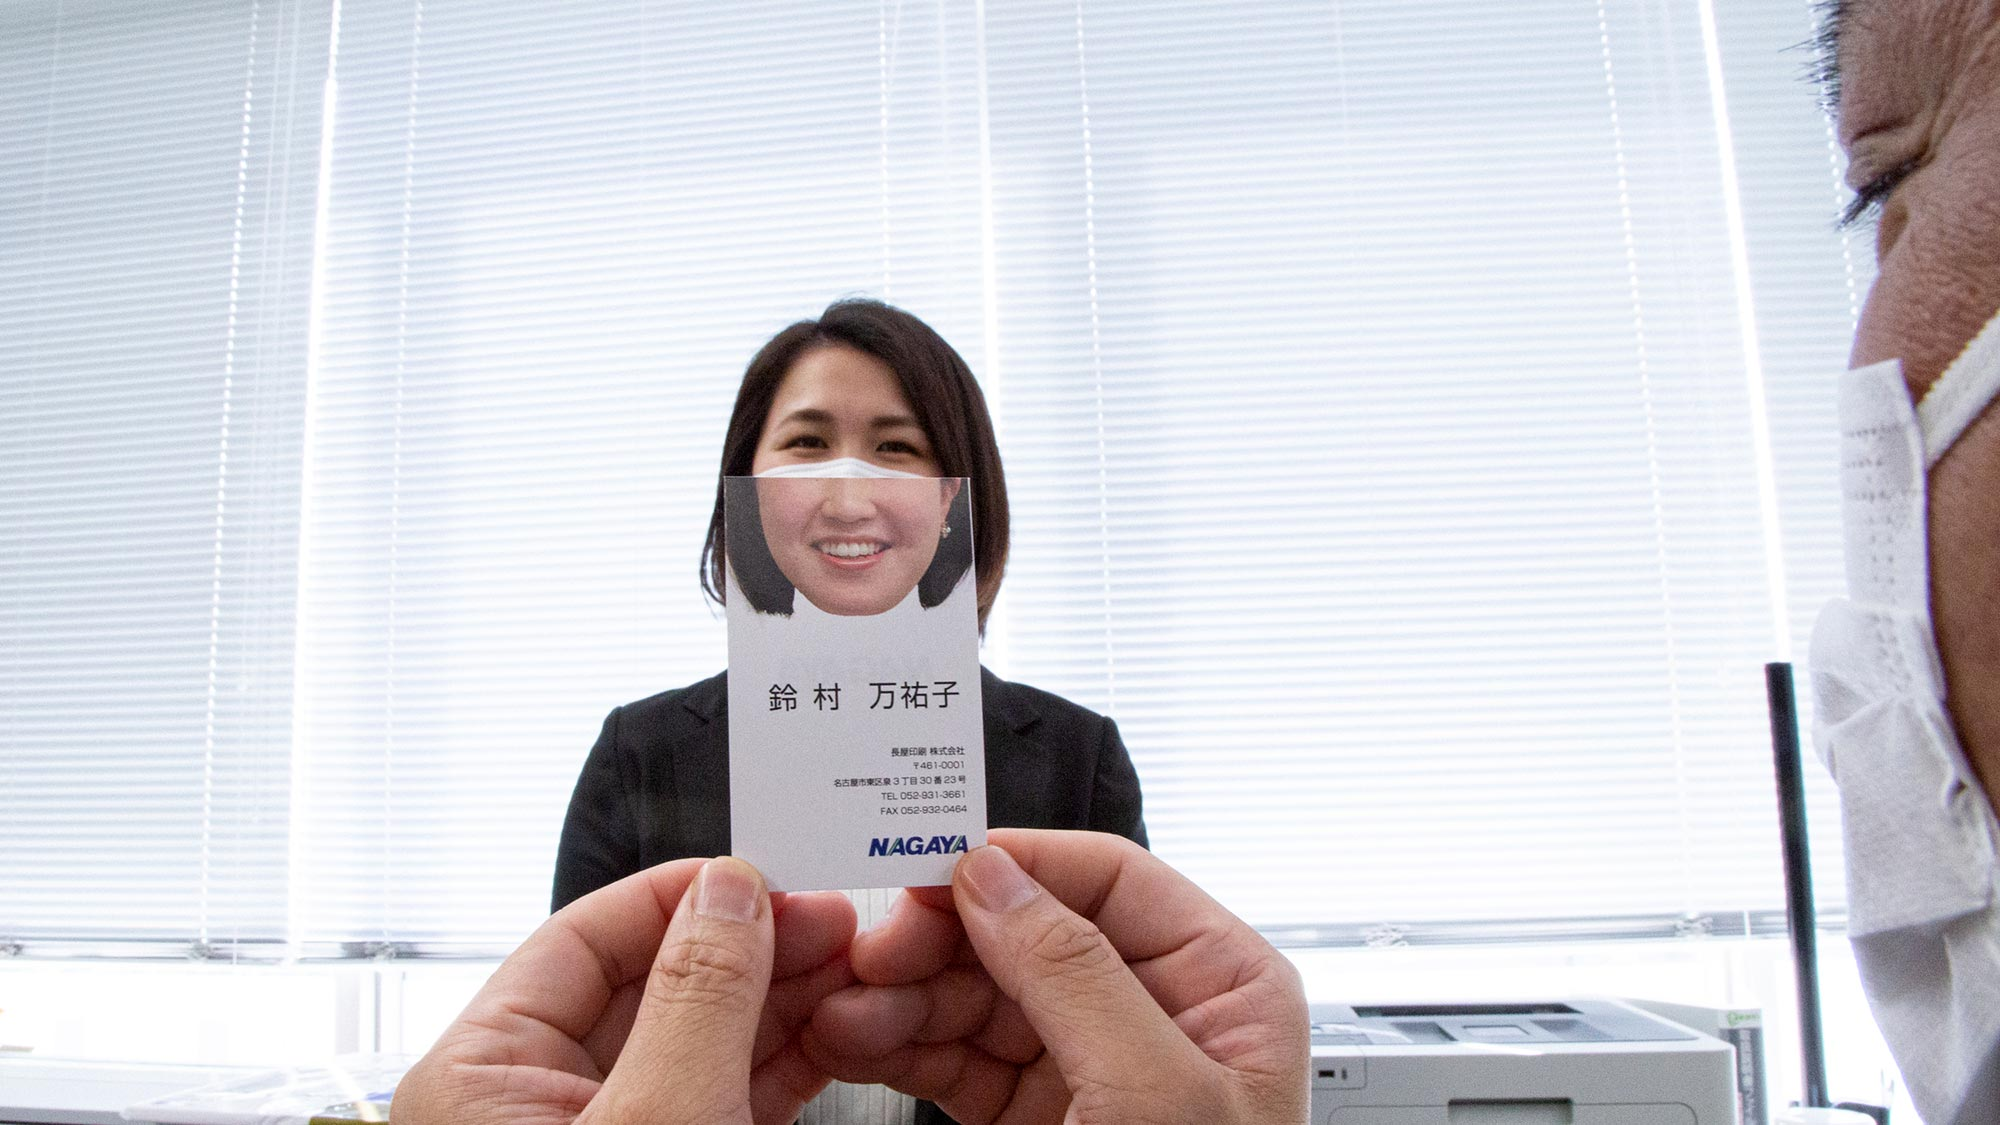 Smile Meishi Business Card by Nagaya Printing Co